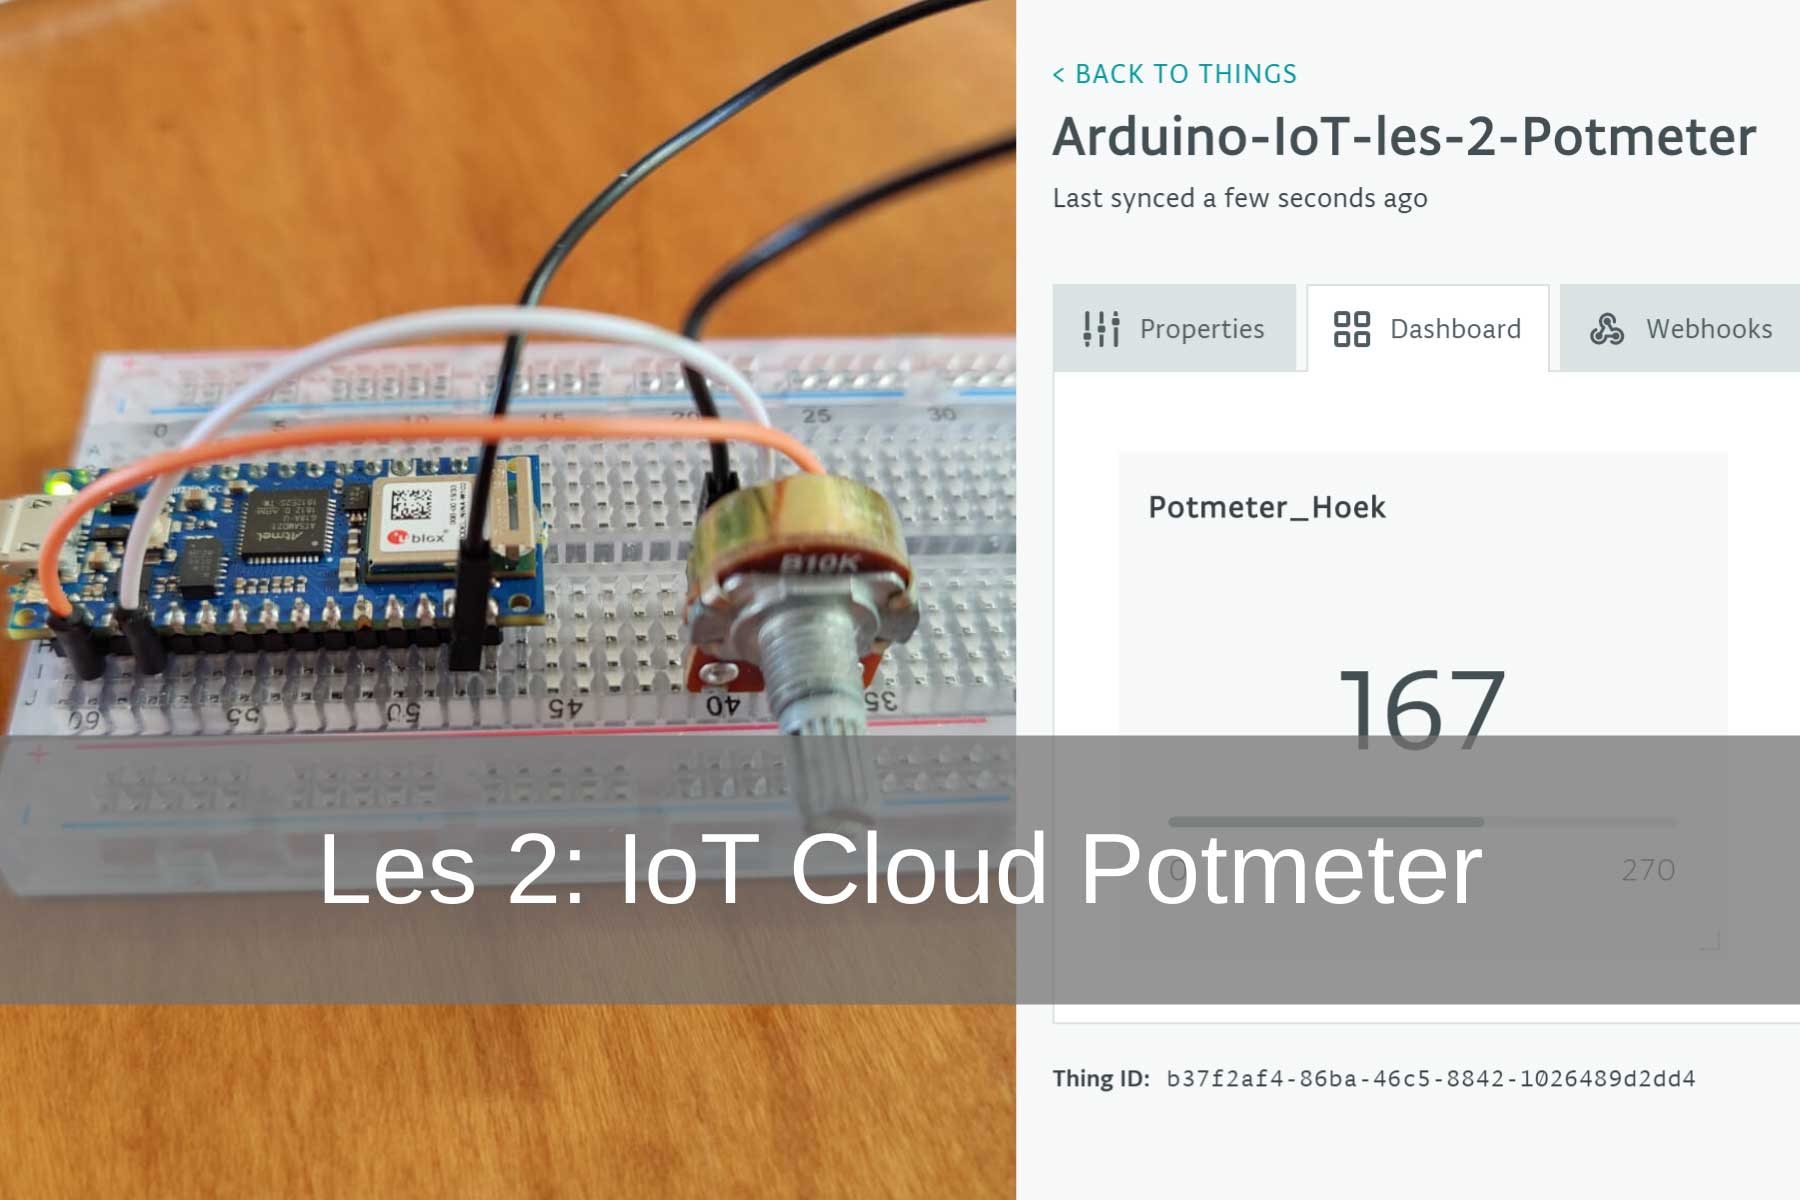 Arduino IoT Cloud Les 2: Potmeter